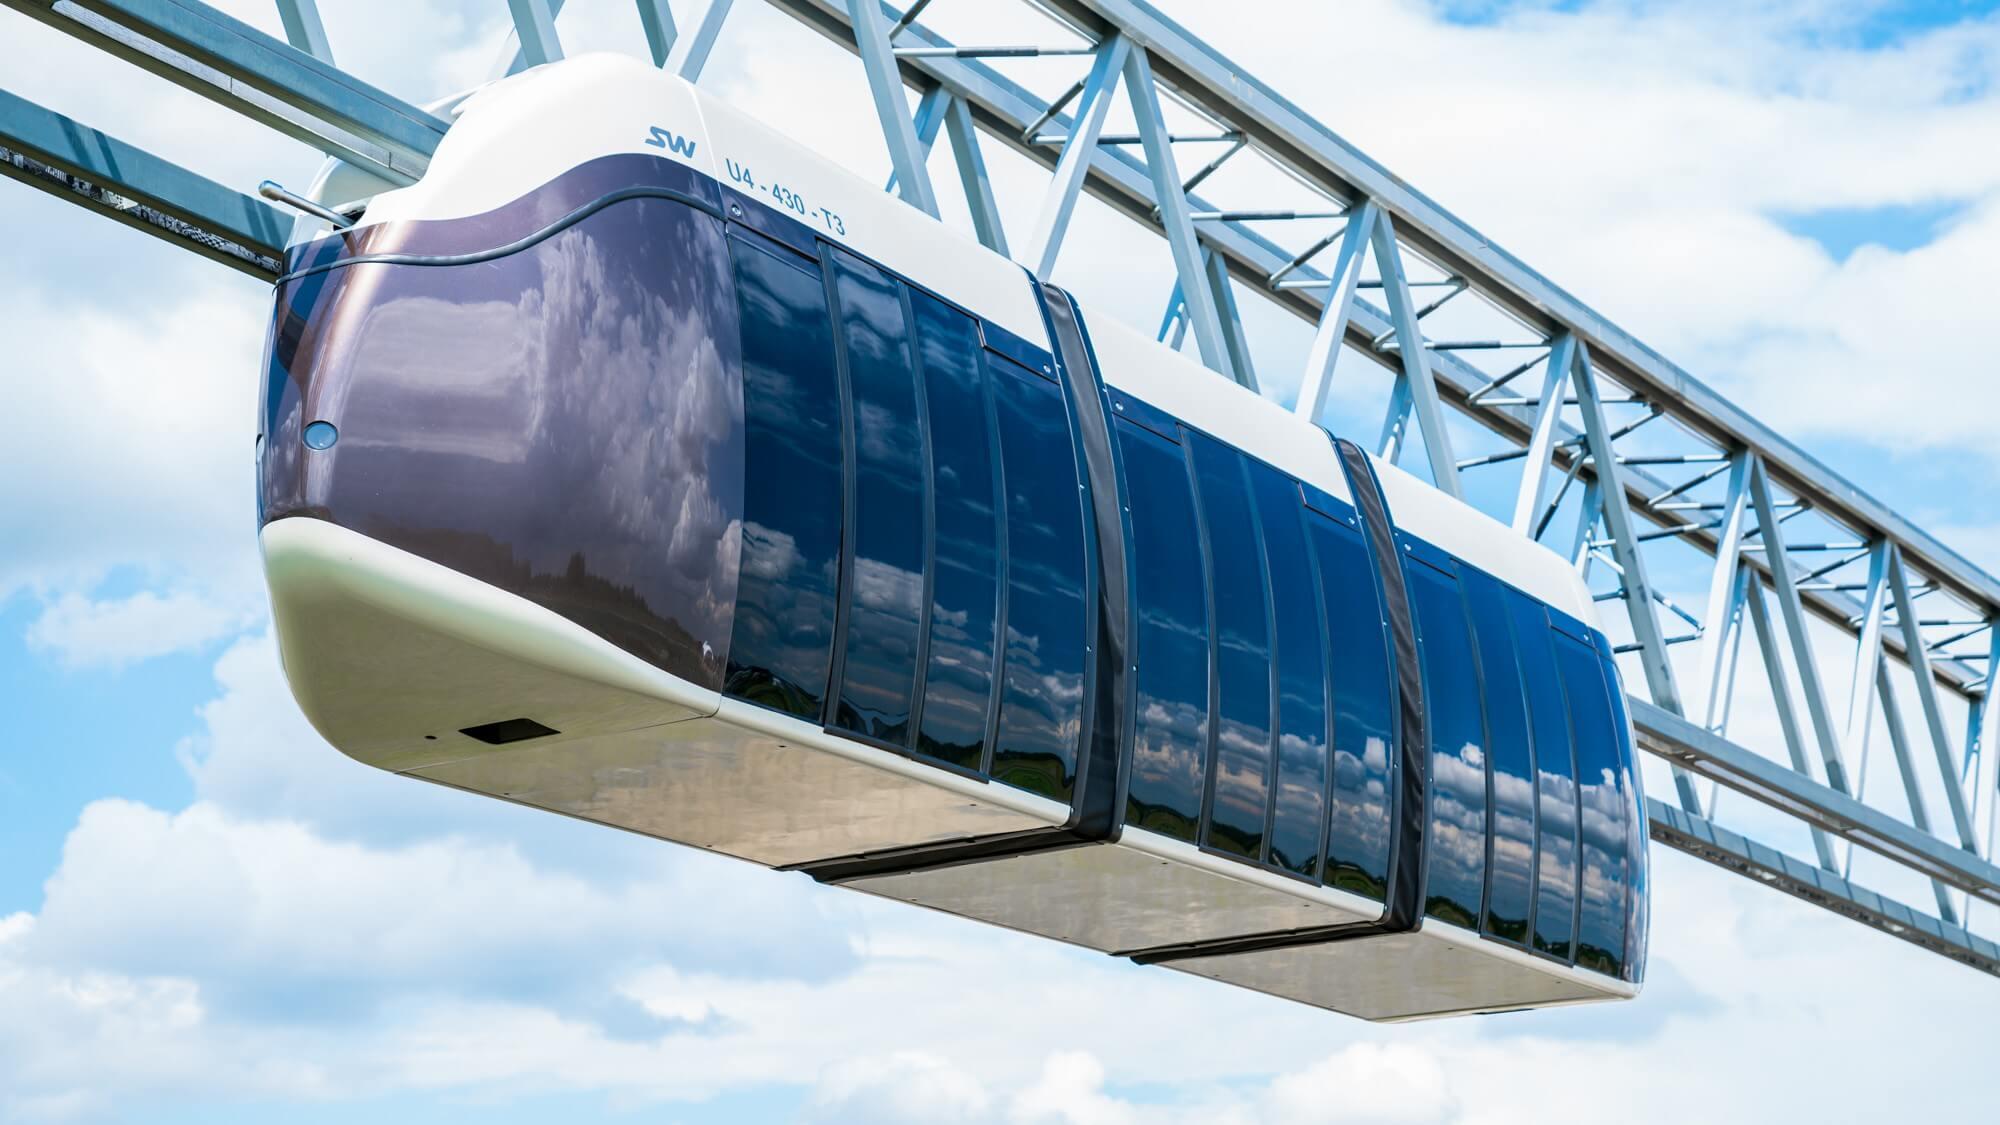 Юникар SkyWay Струнный транспорт